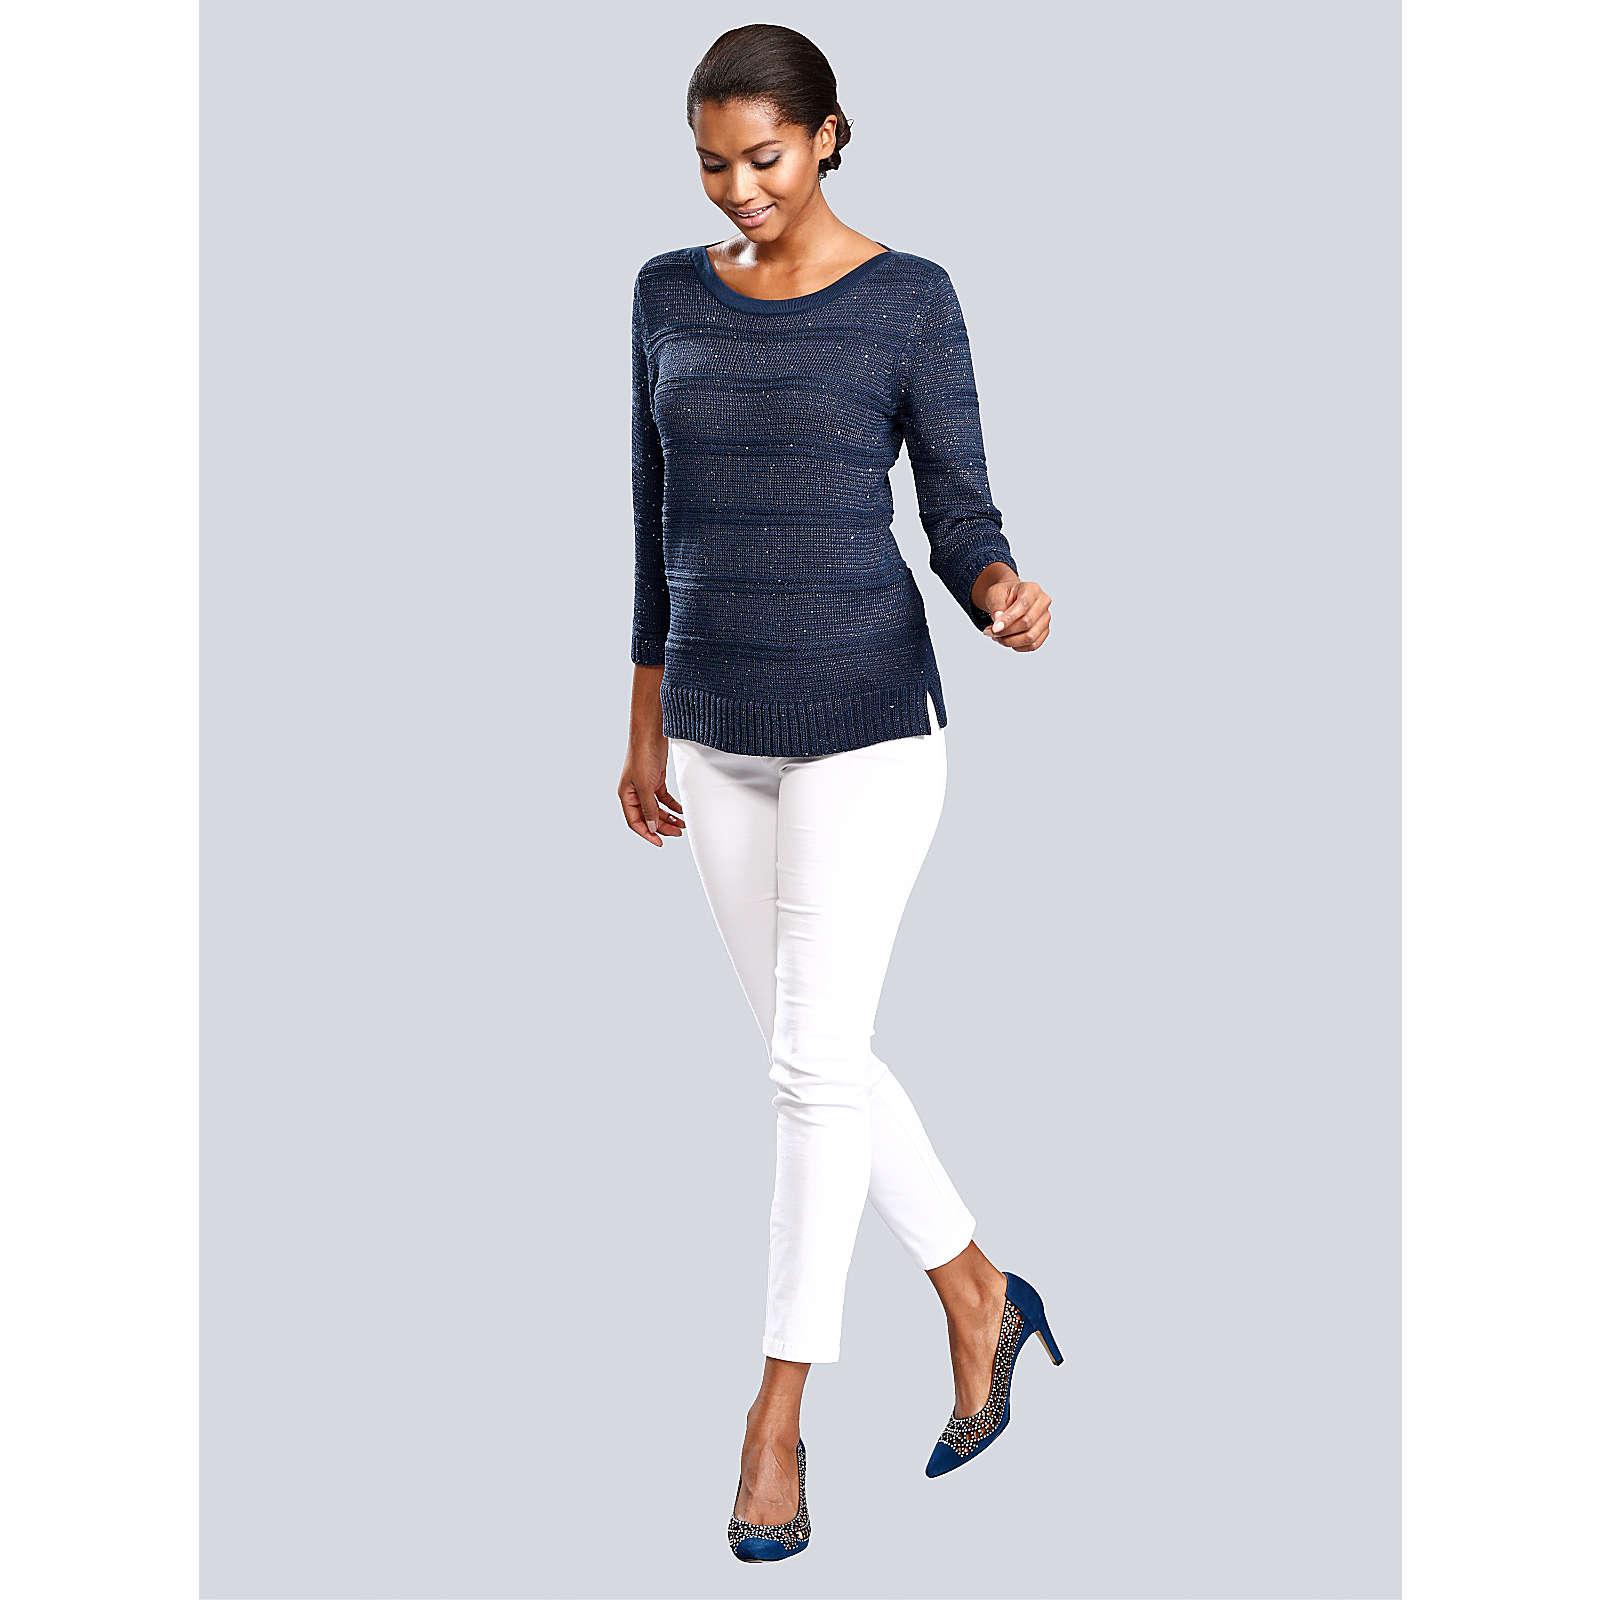 Alba Moda Pullover dunkelblau Damen Gr. 38